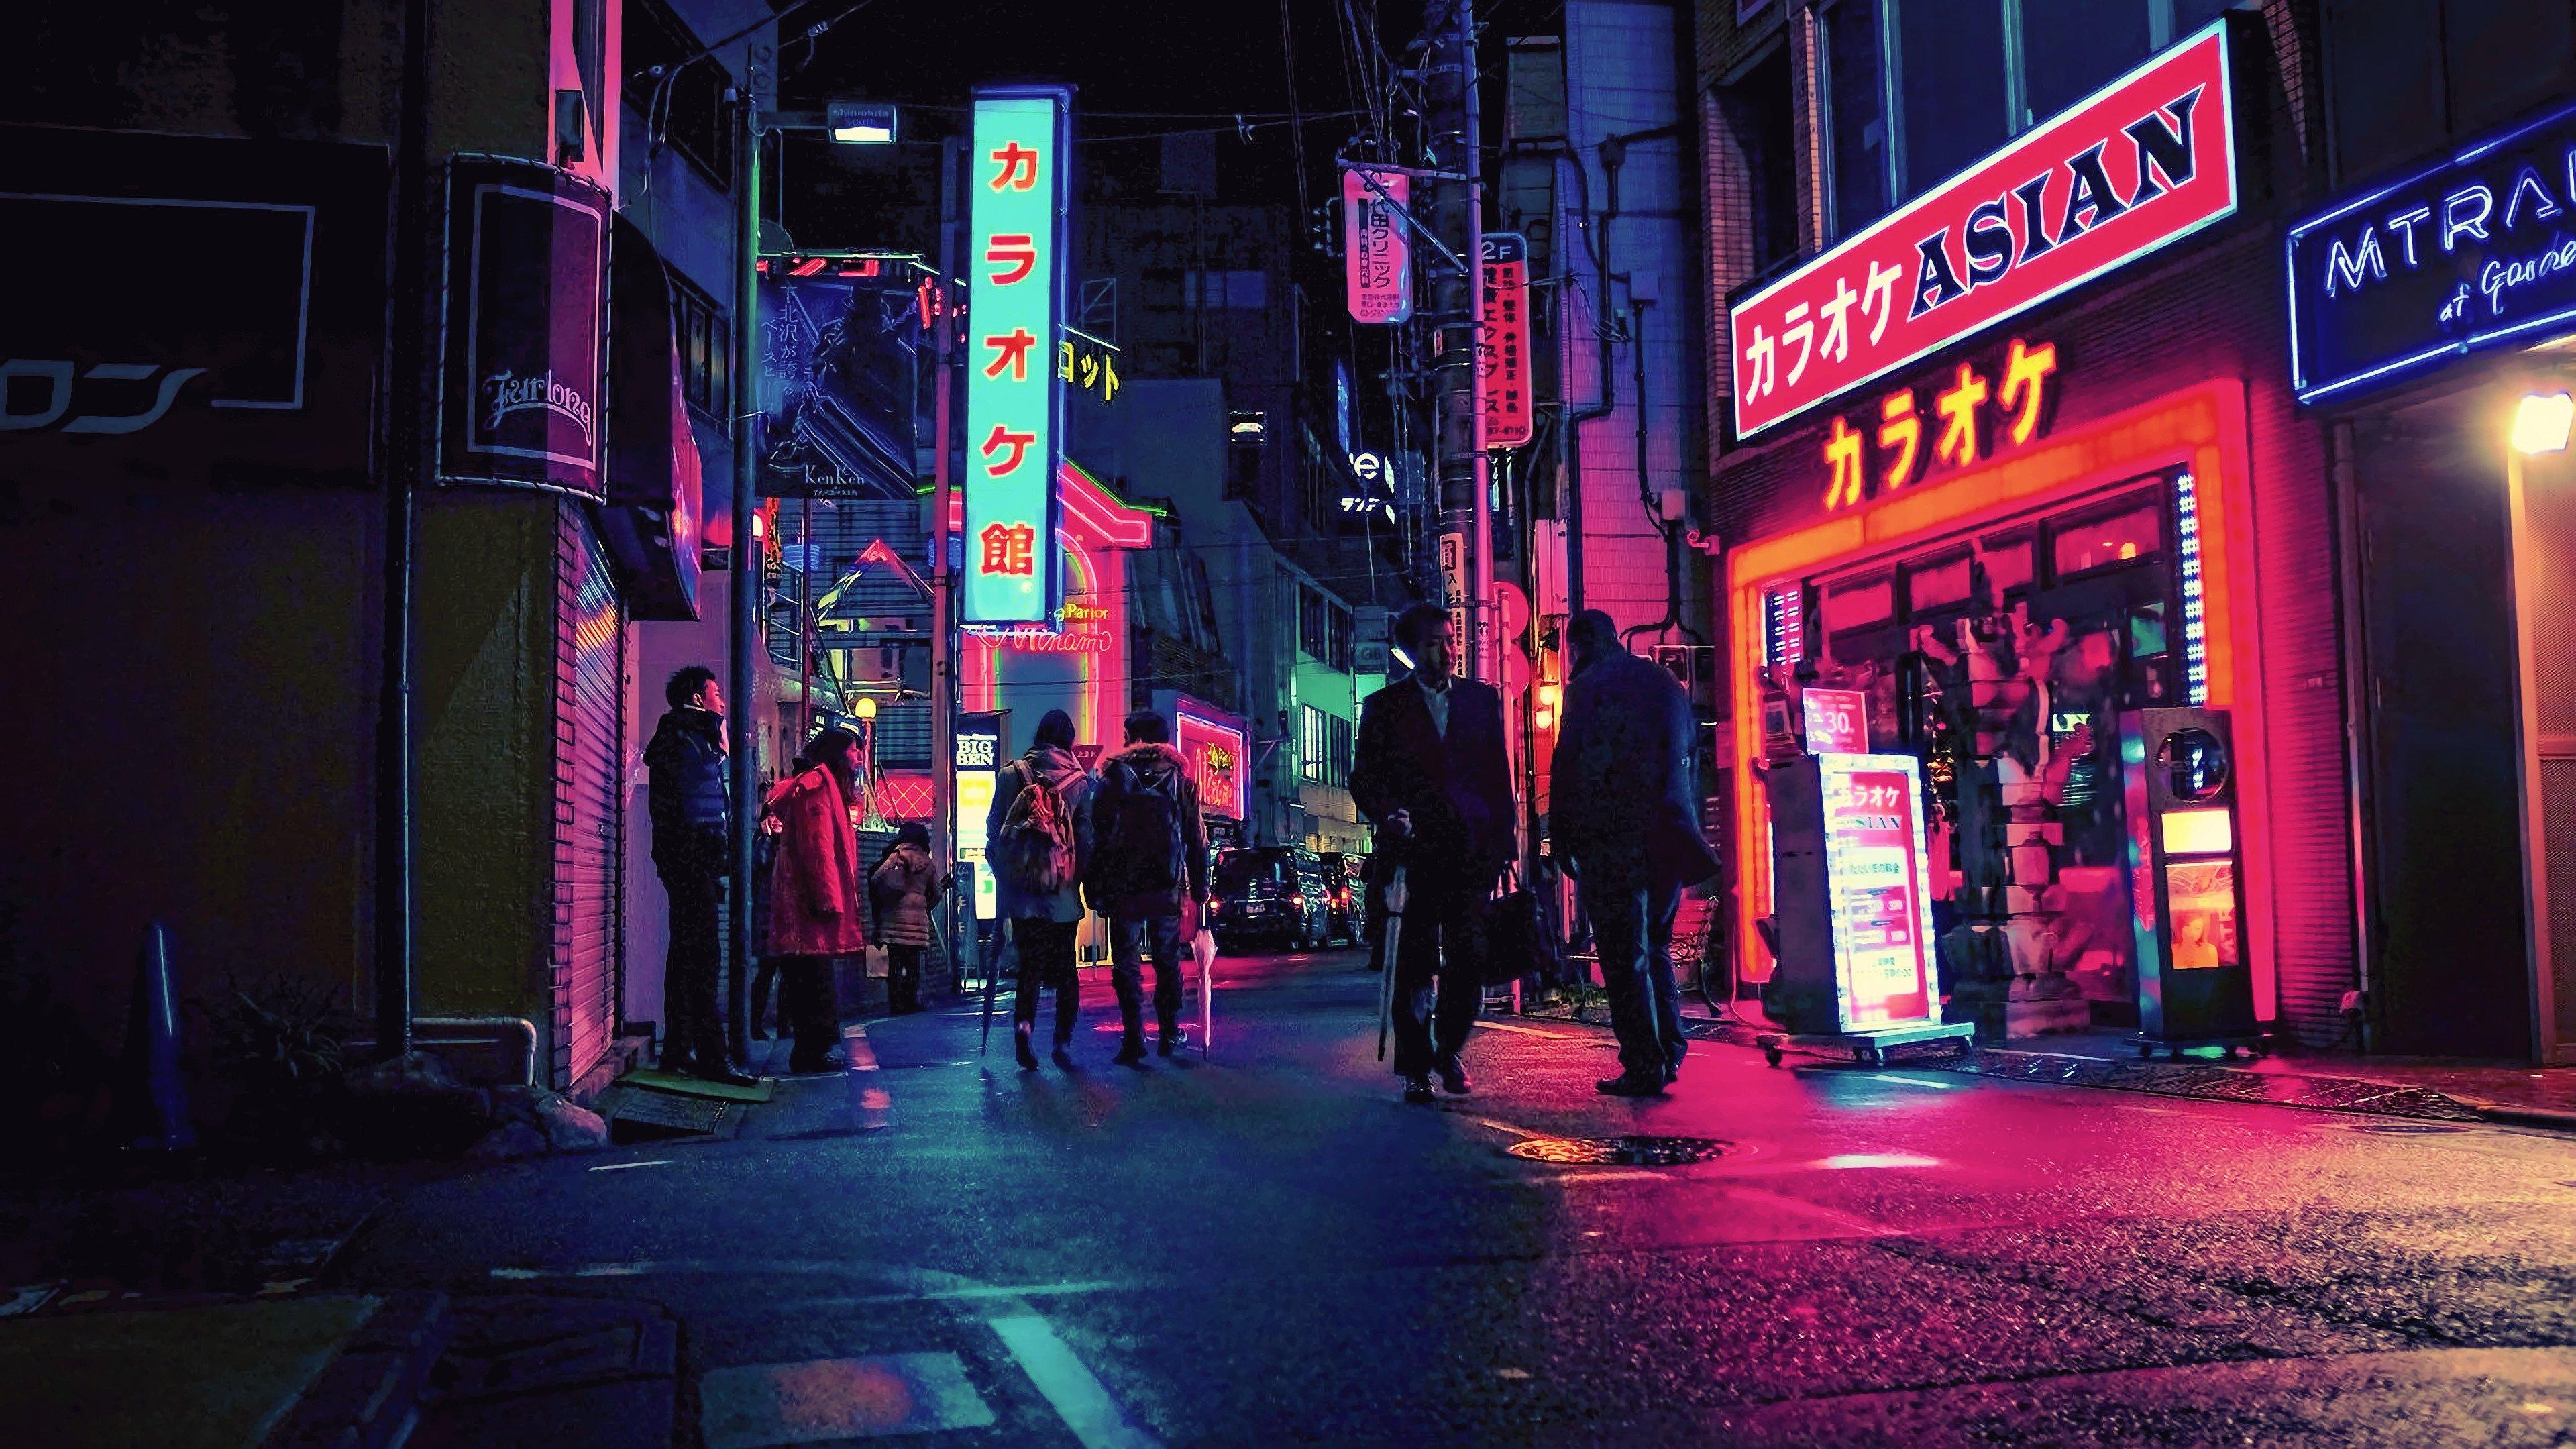 4k Japan Wallpaper Posted By Christopher Peltier